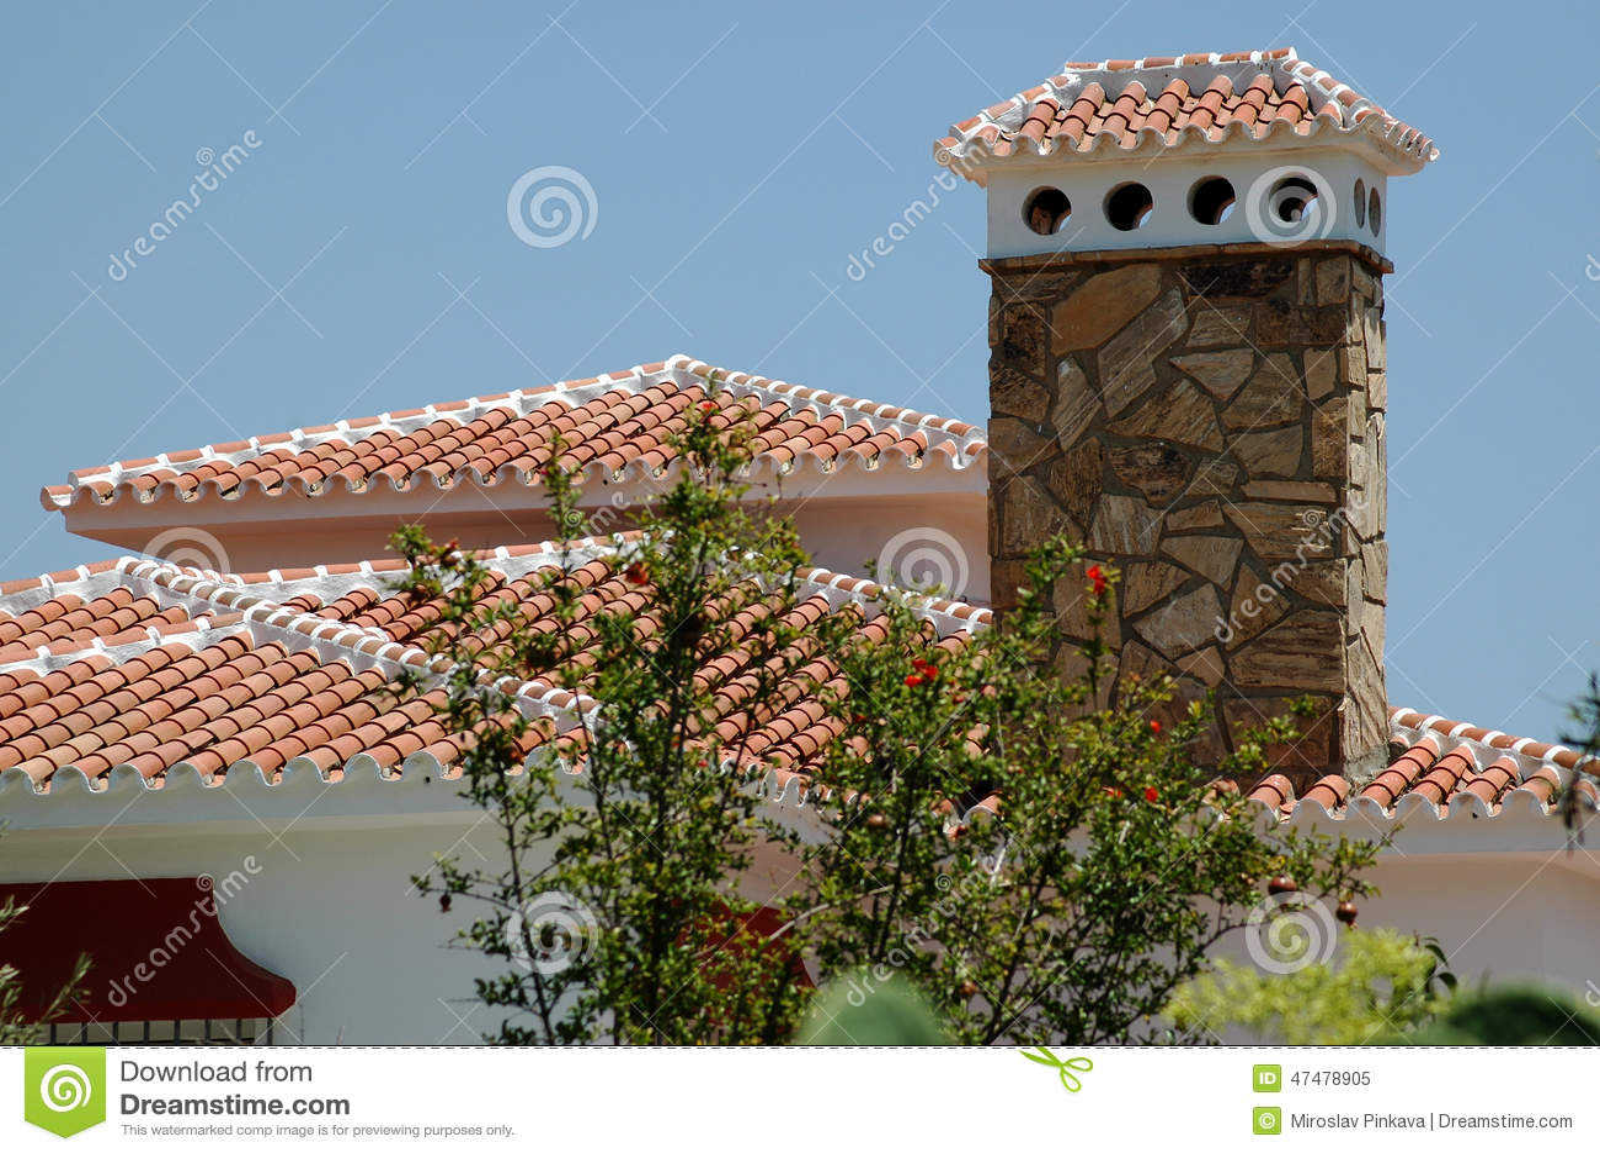 Decorative Chimney